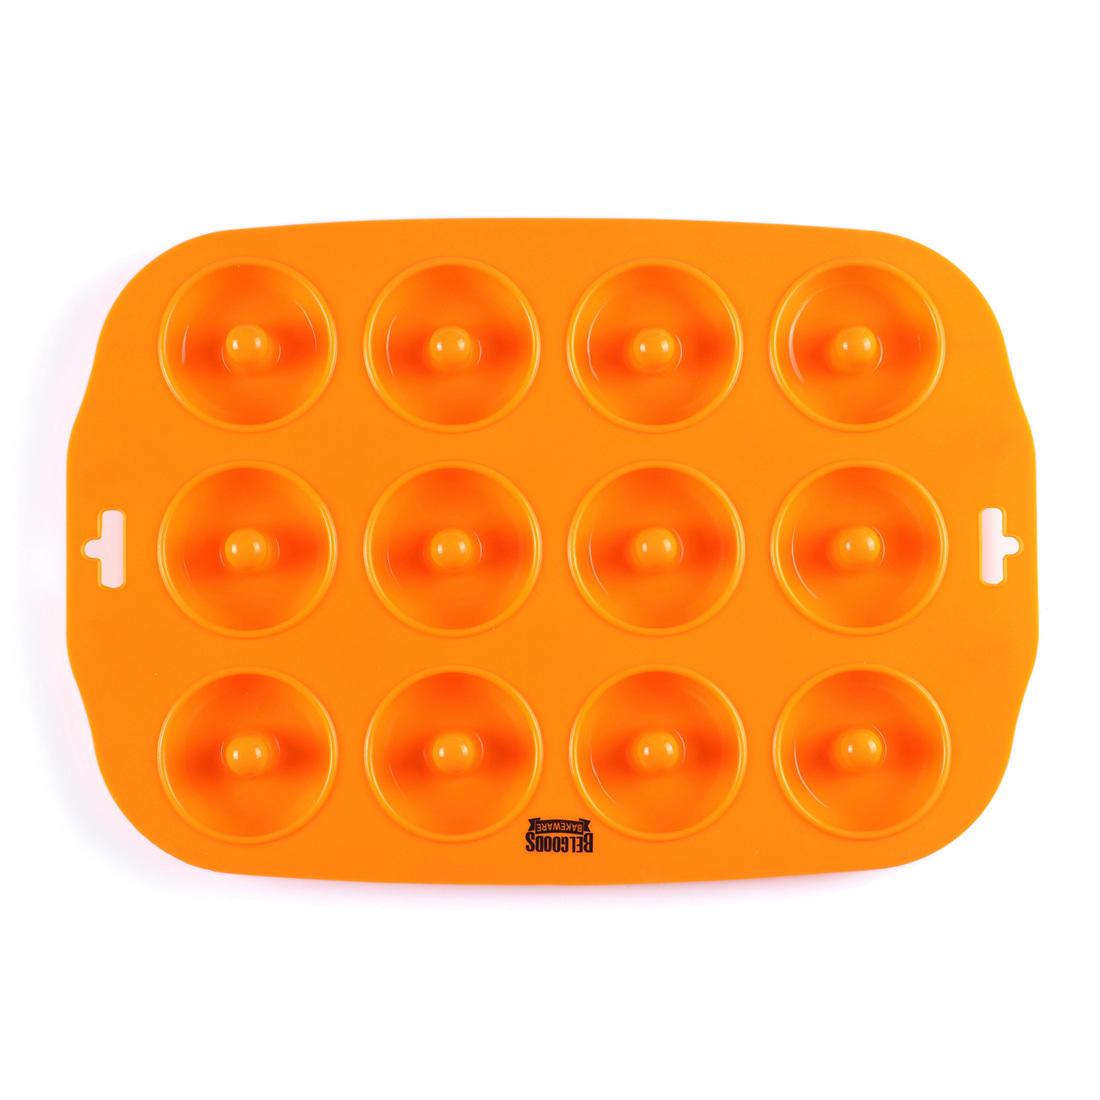 Wholesale 12 Cavities Mini size Non-stick silicone donut tray